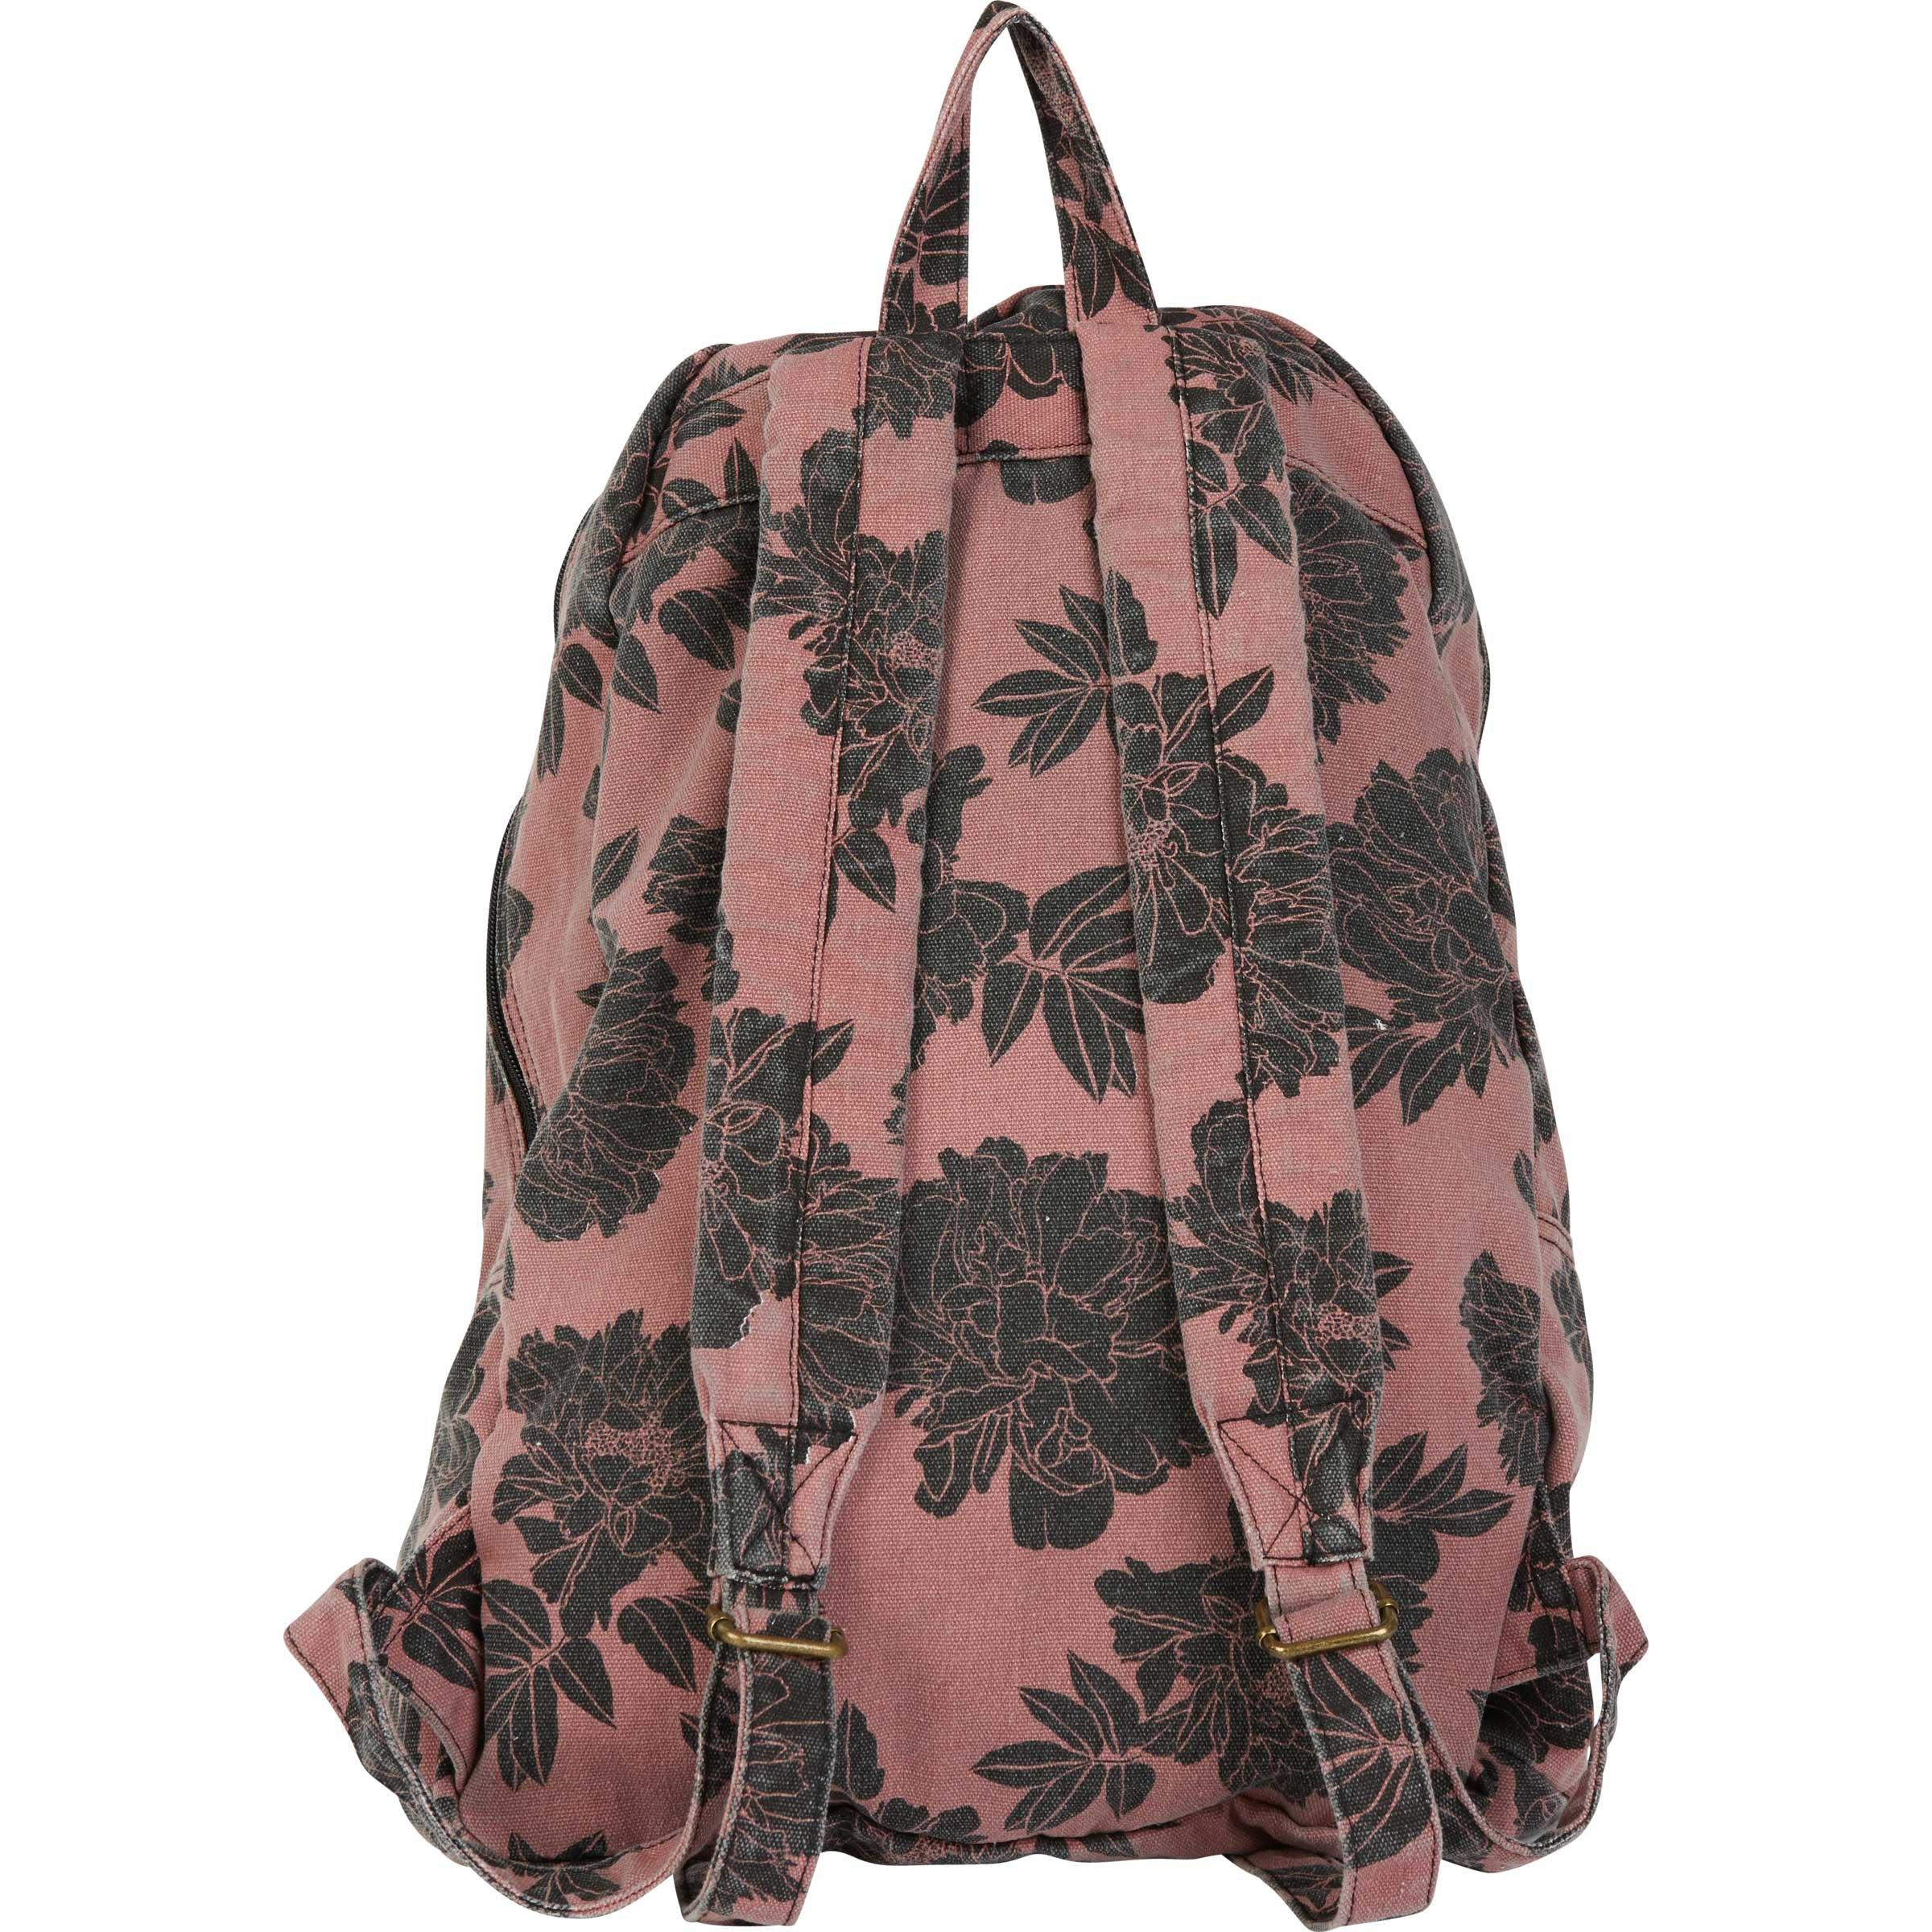 Billabong Women's Hand Over Love Backpack, Vintage Plum, ONE by Billabong (Image #3)